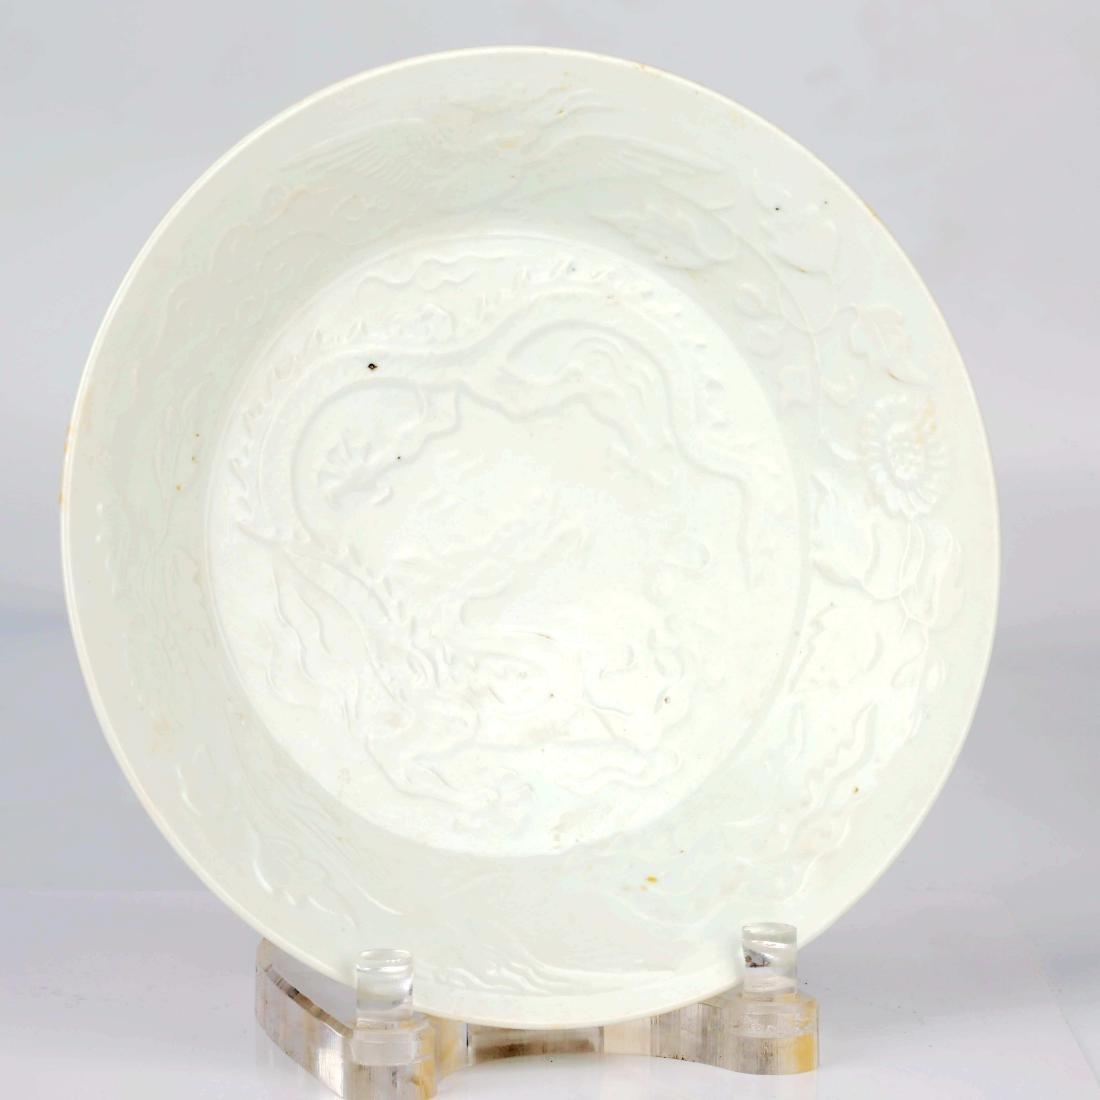 Chinese white glaze dragon design plate